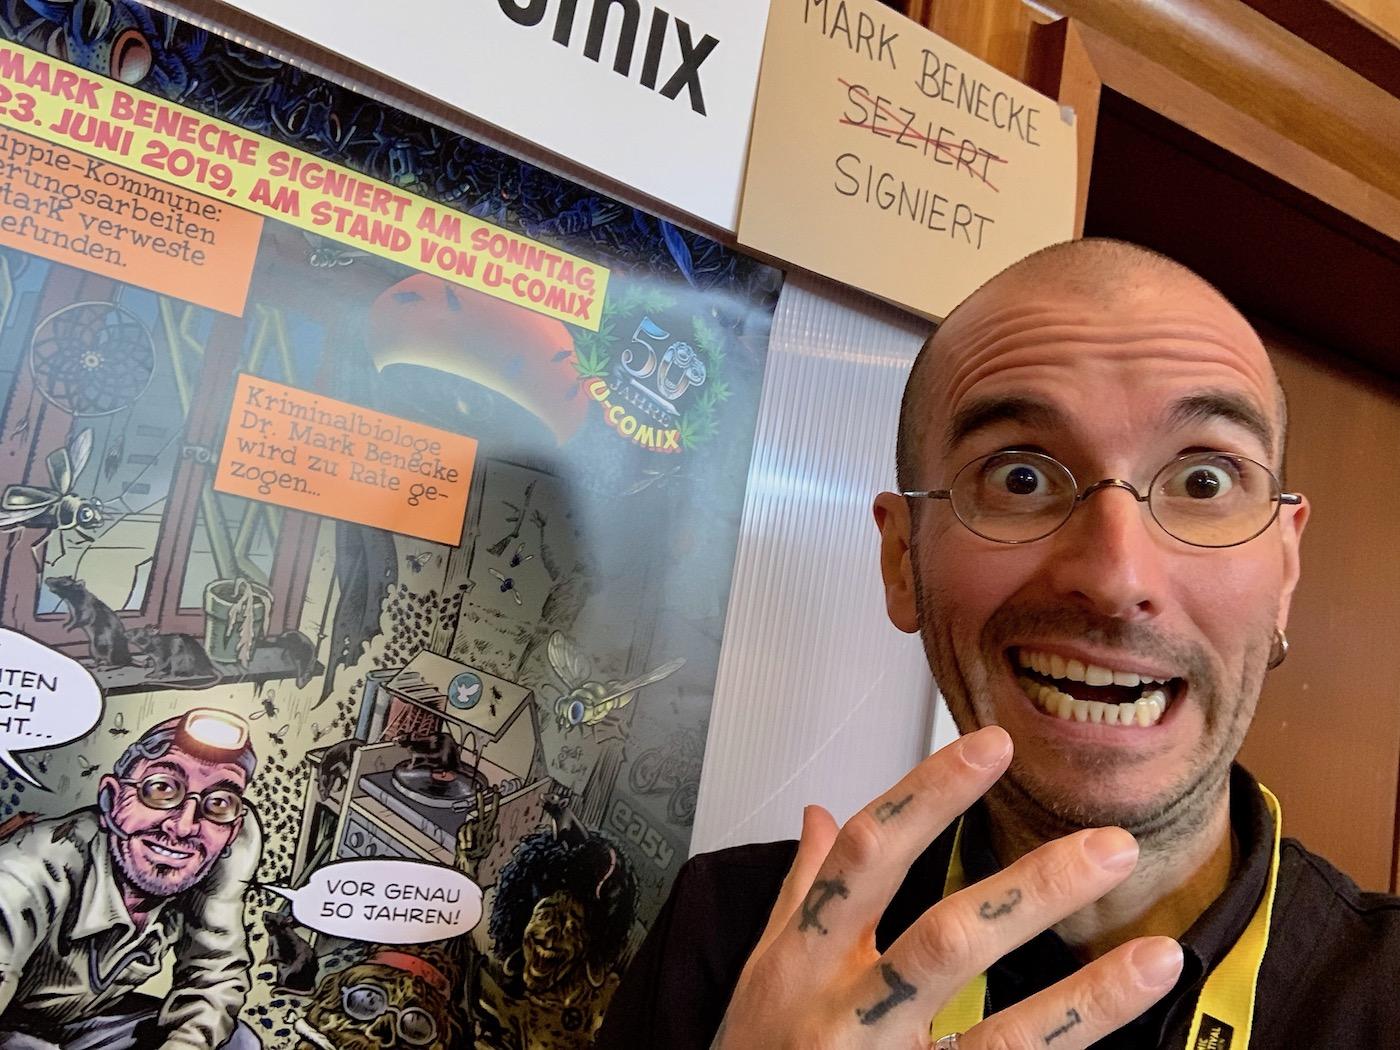 mark_benecke_comic_festival_muenchen_munich_comic_con_2019 - 100.jpg